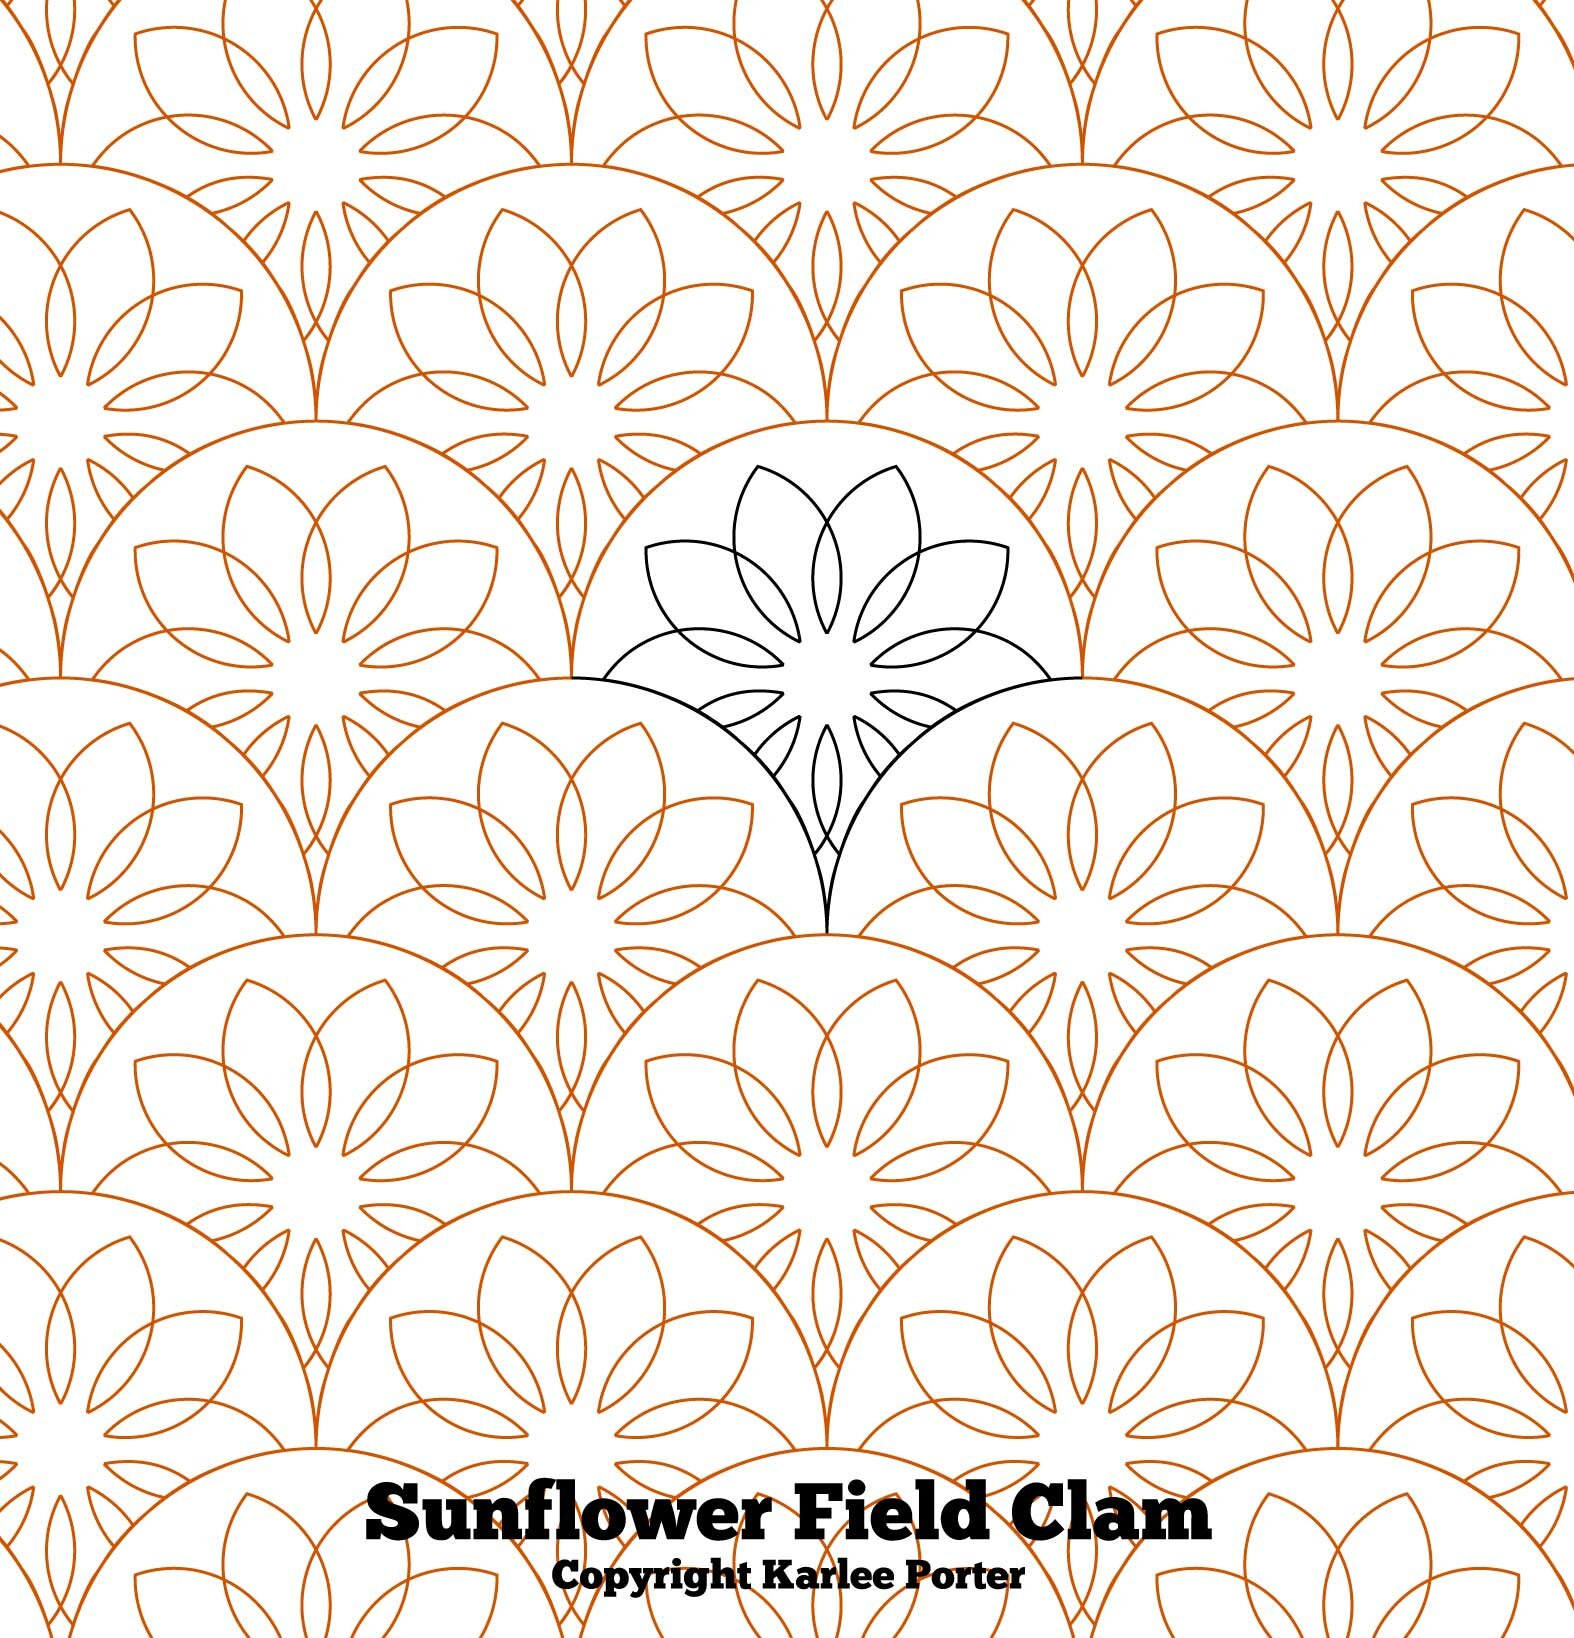 Sunflower Field Clam